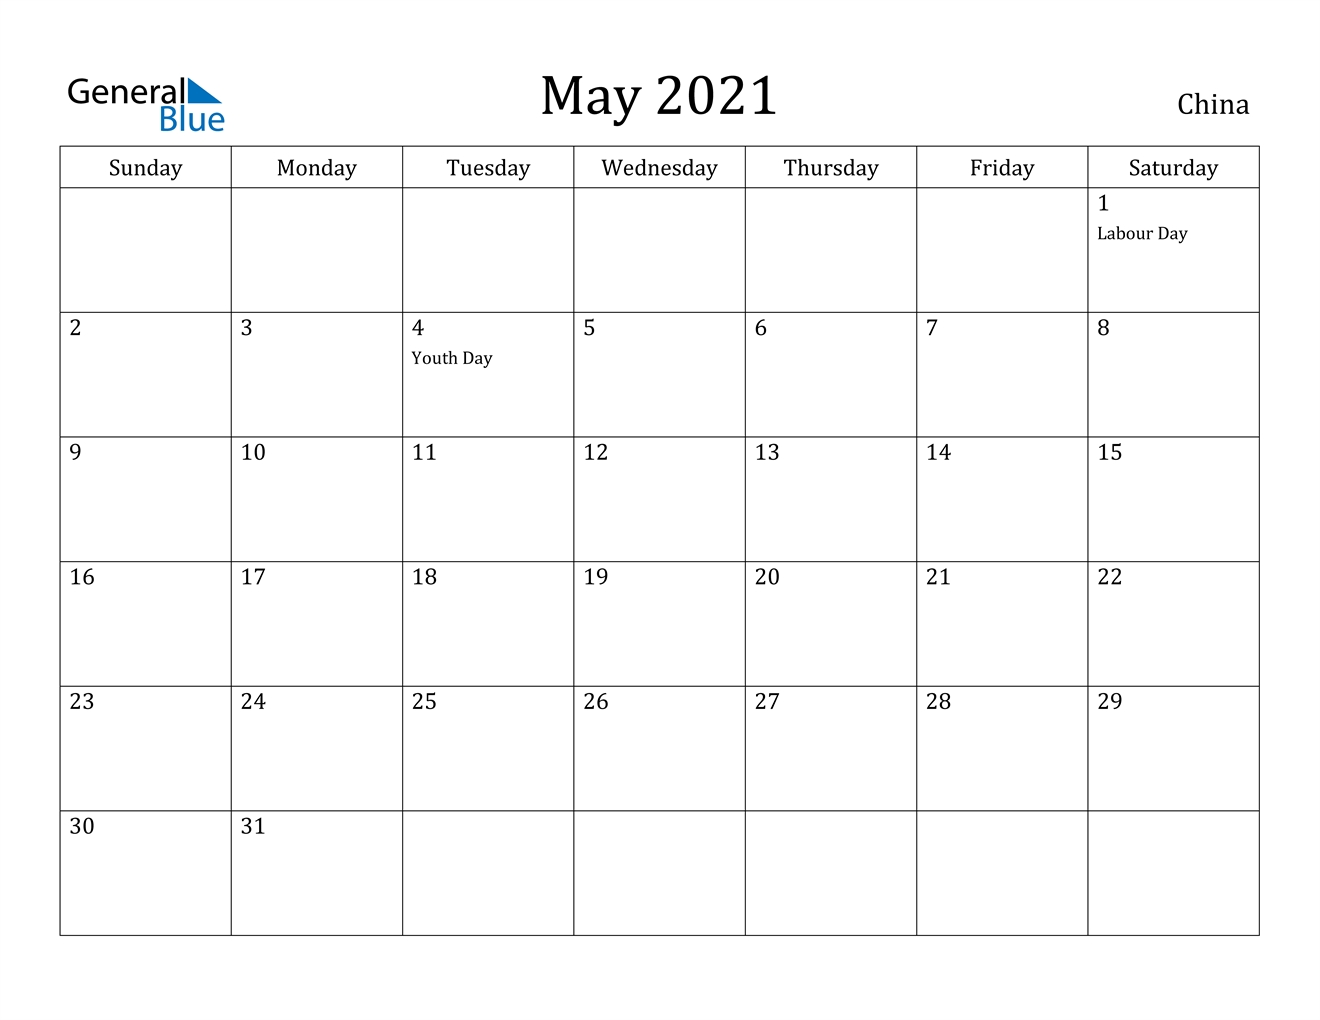 Take China Holiday Calendar 2021